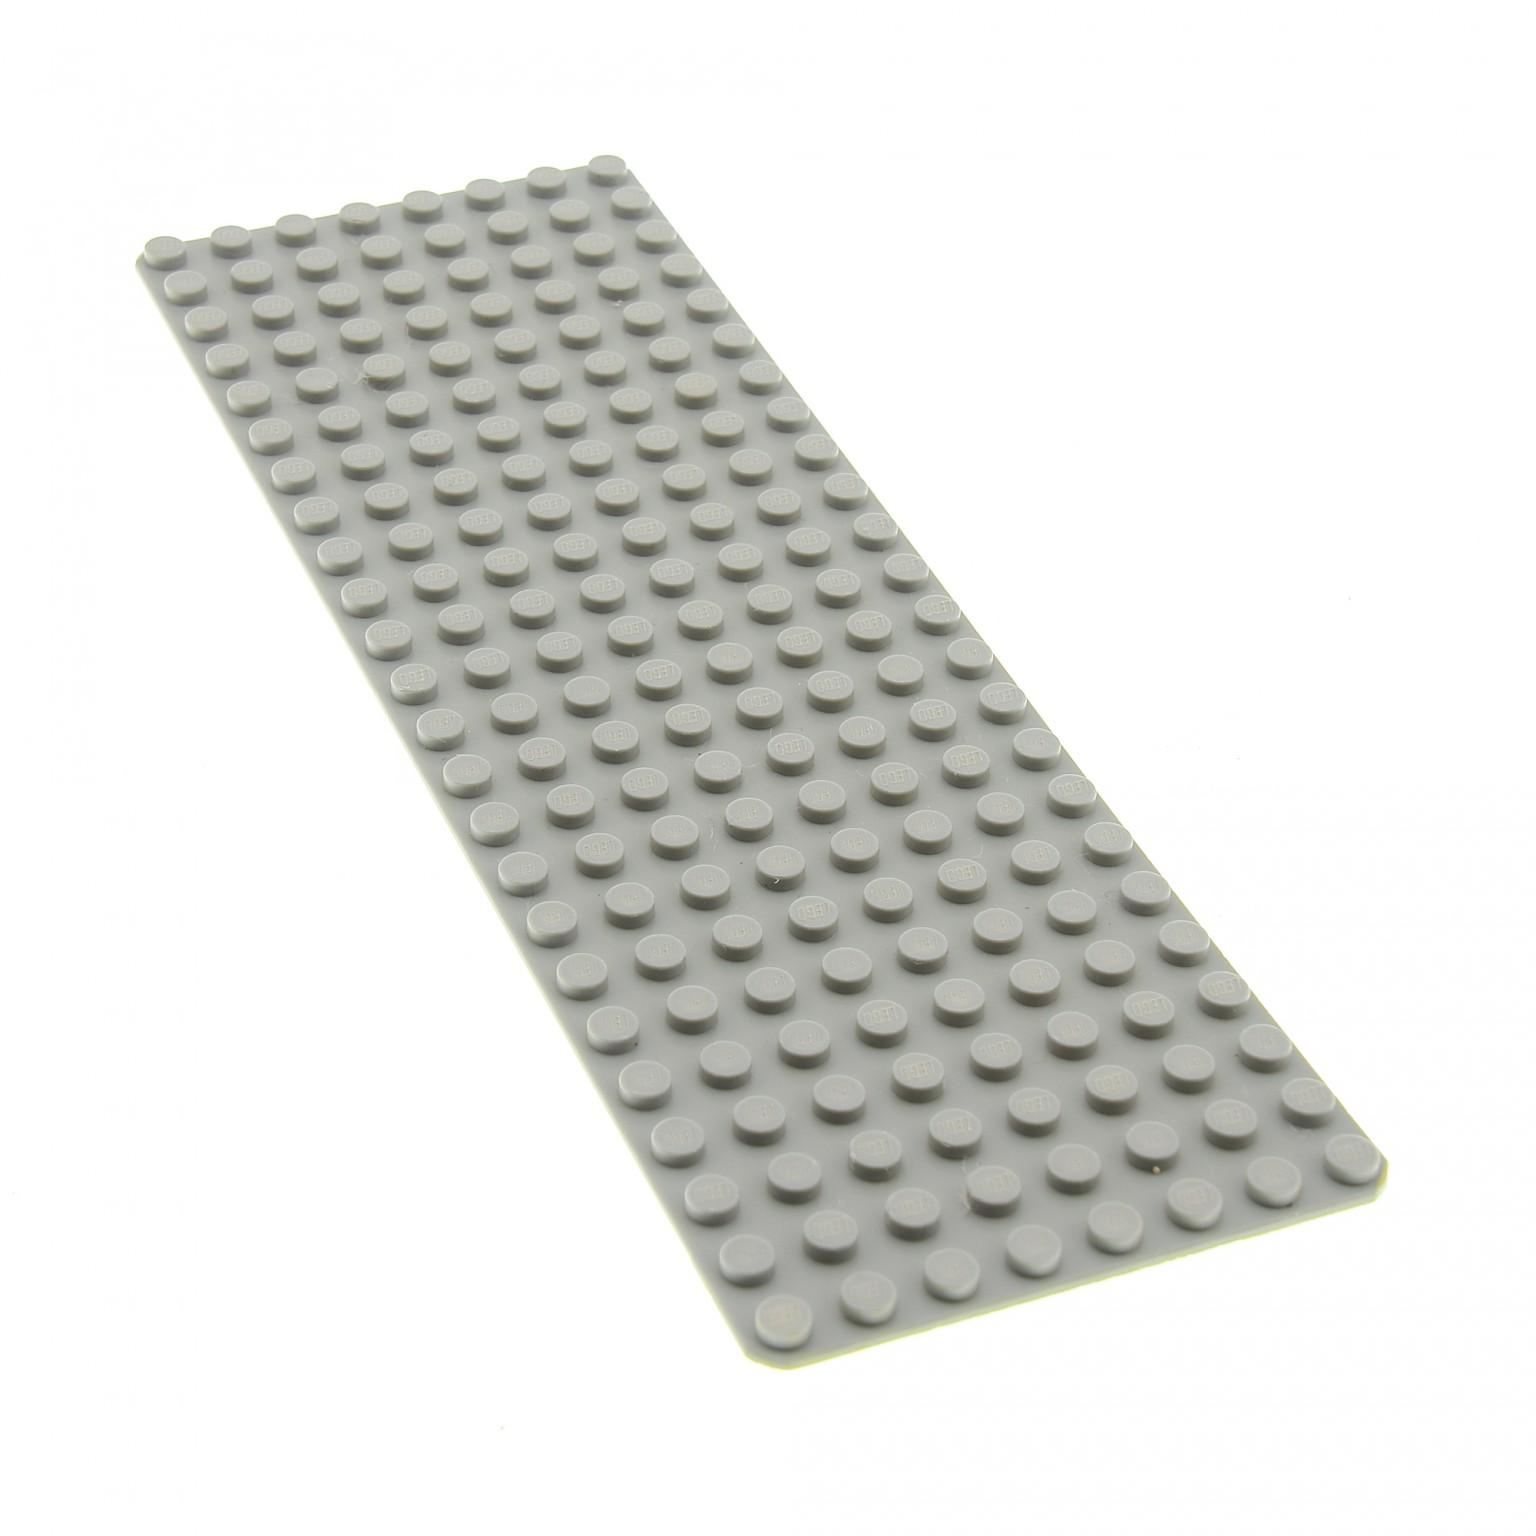 LEGO Platte 24x24 Noppen Wasser blau blue baseplate with studs on edges 367